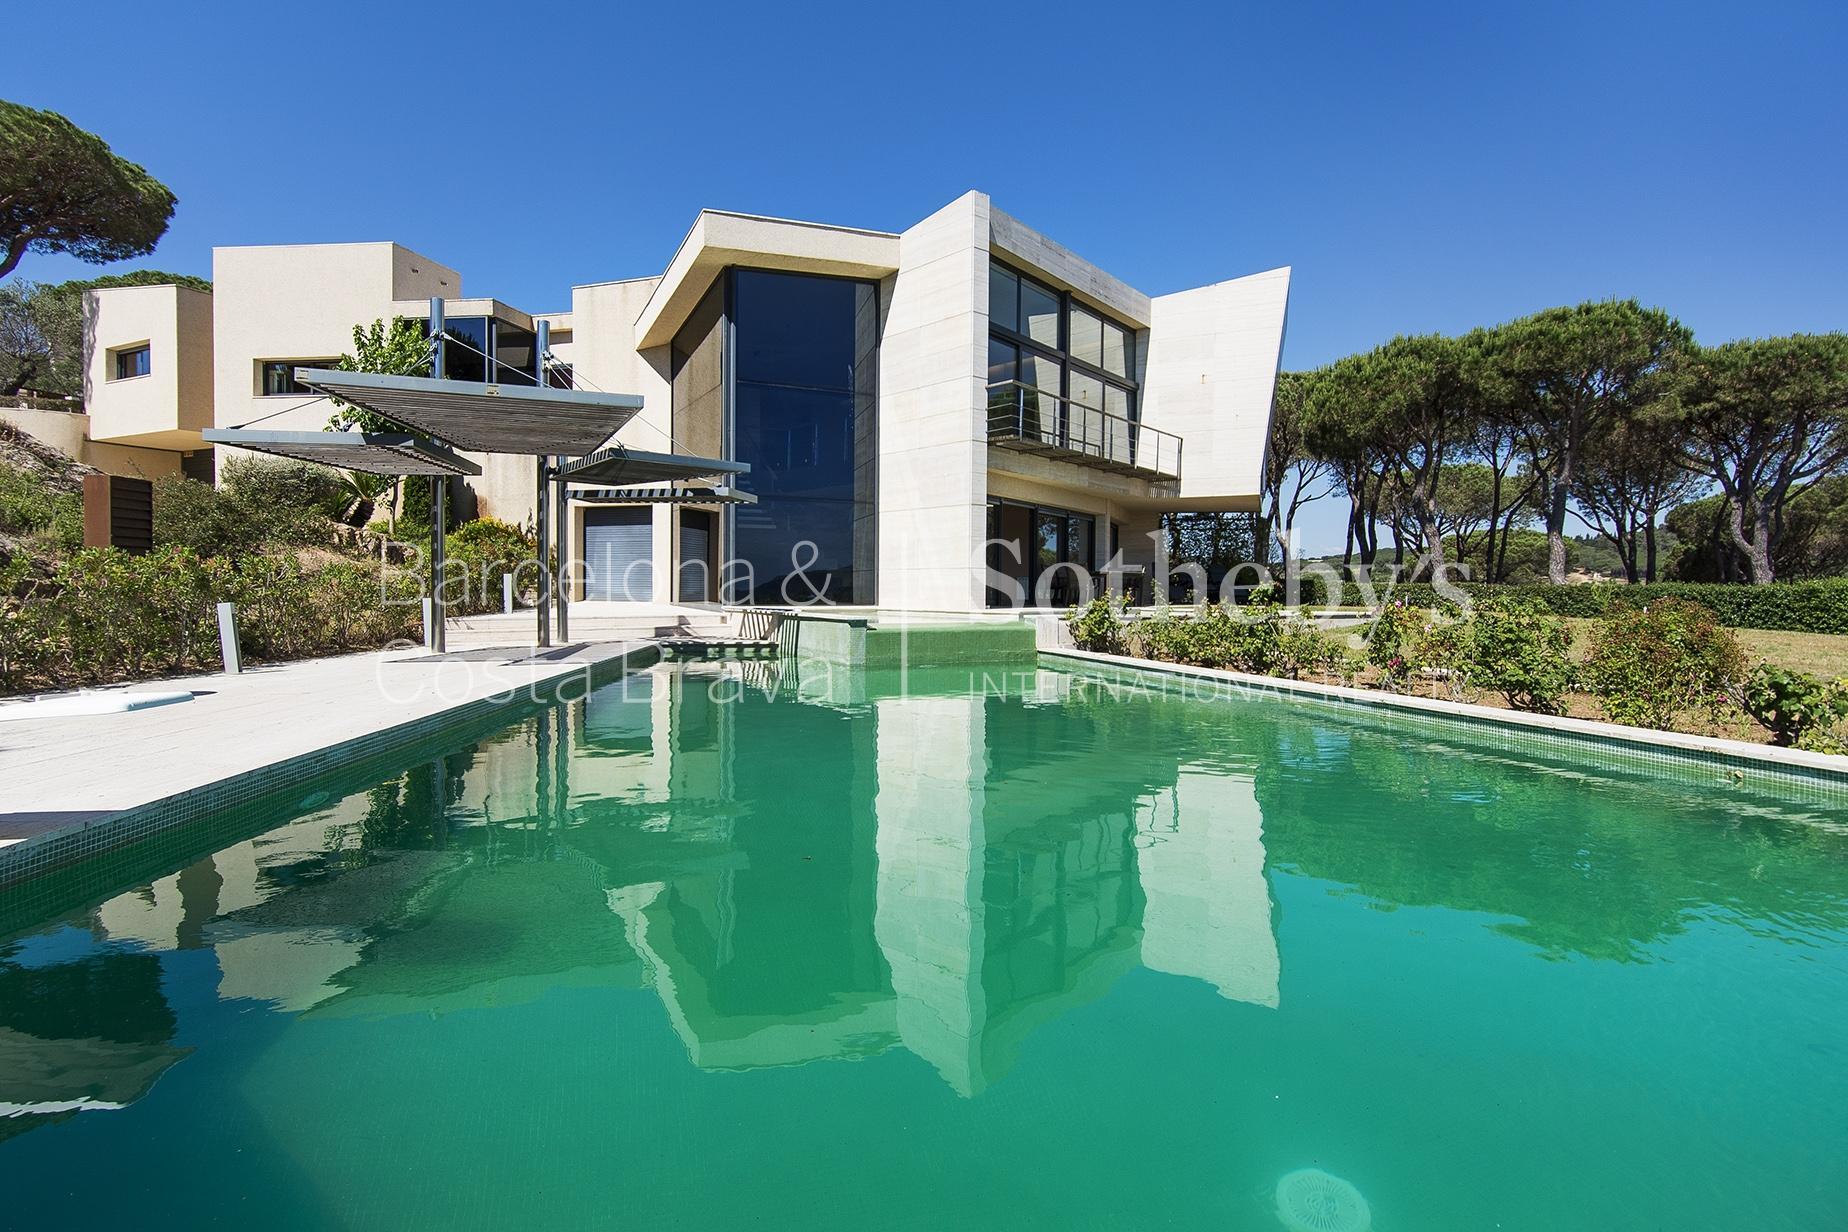 Property For Sale at Fantastic villa in a quiet urbanization